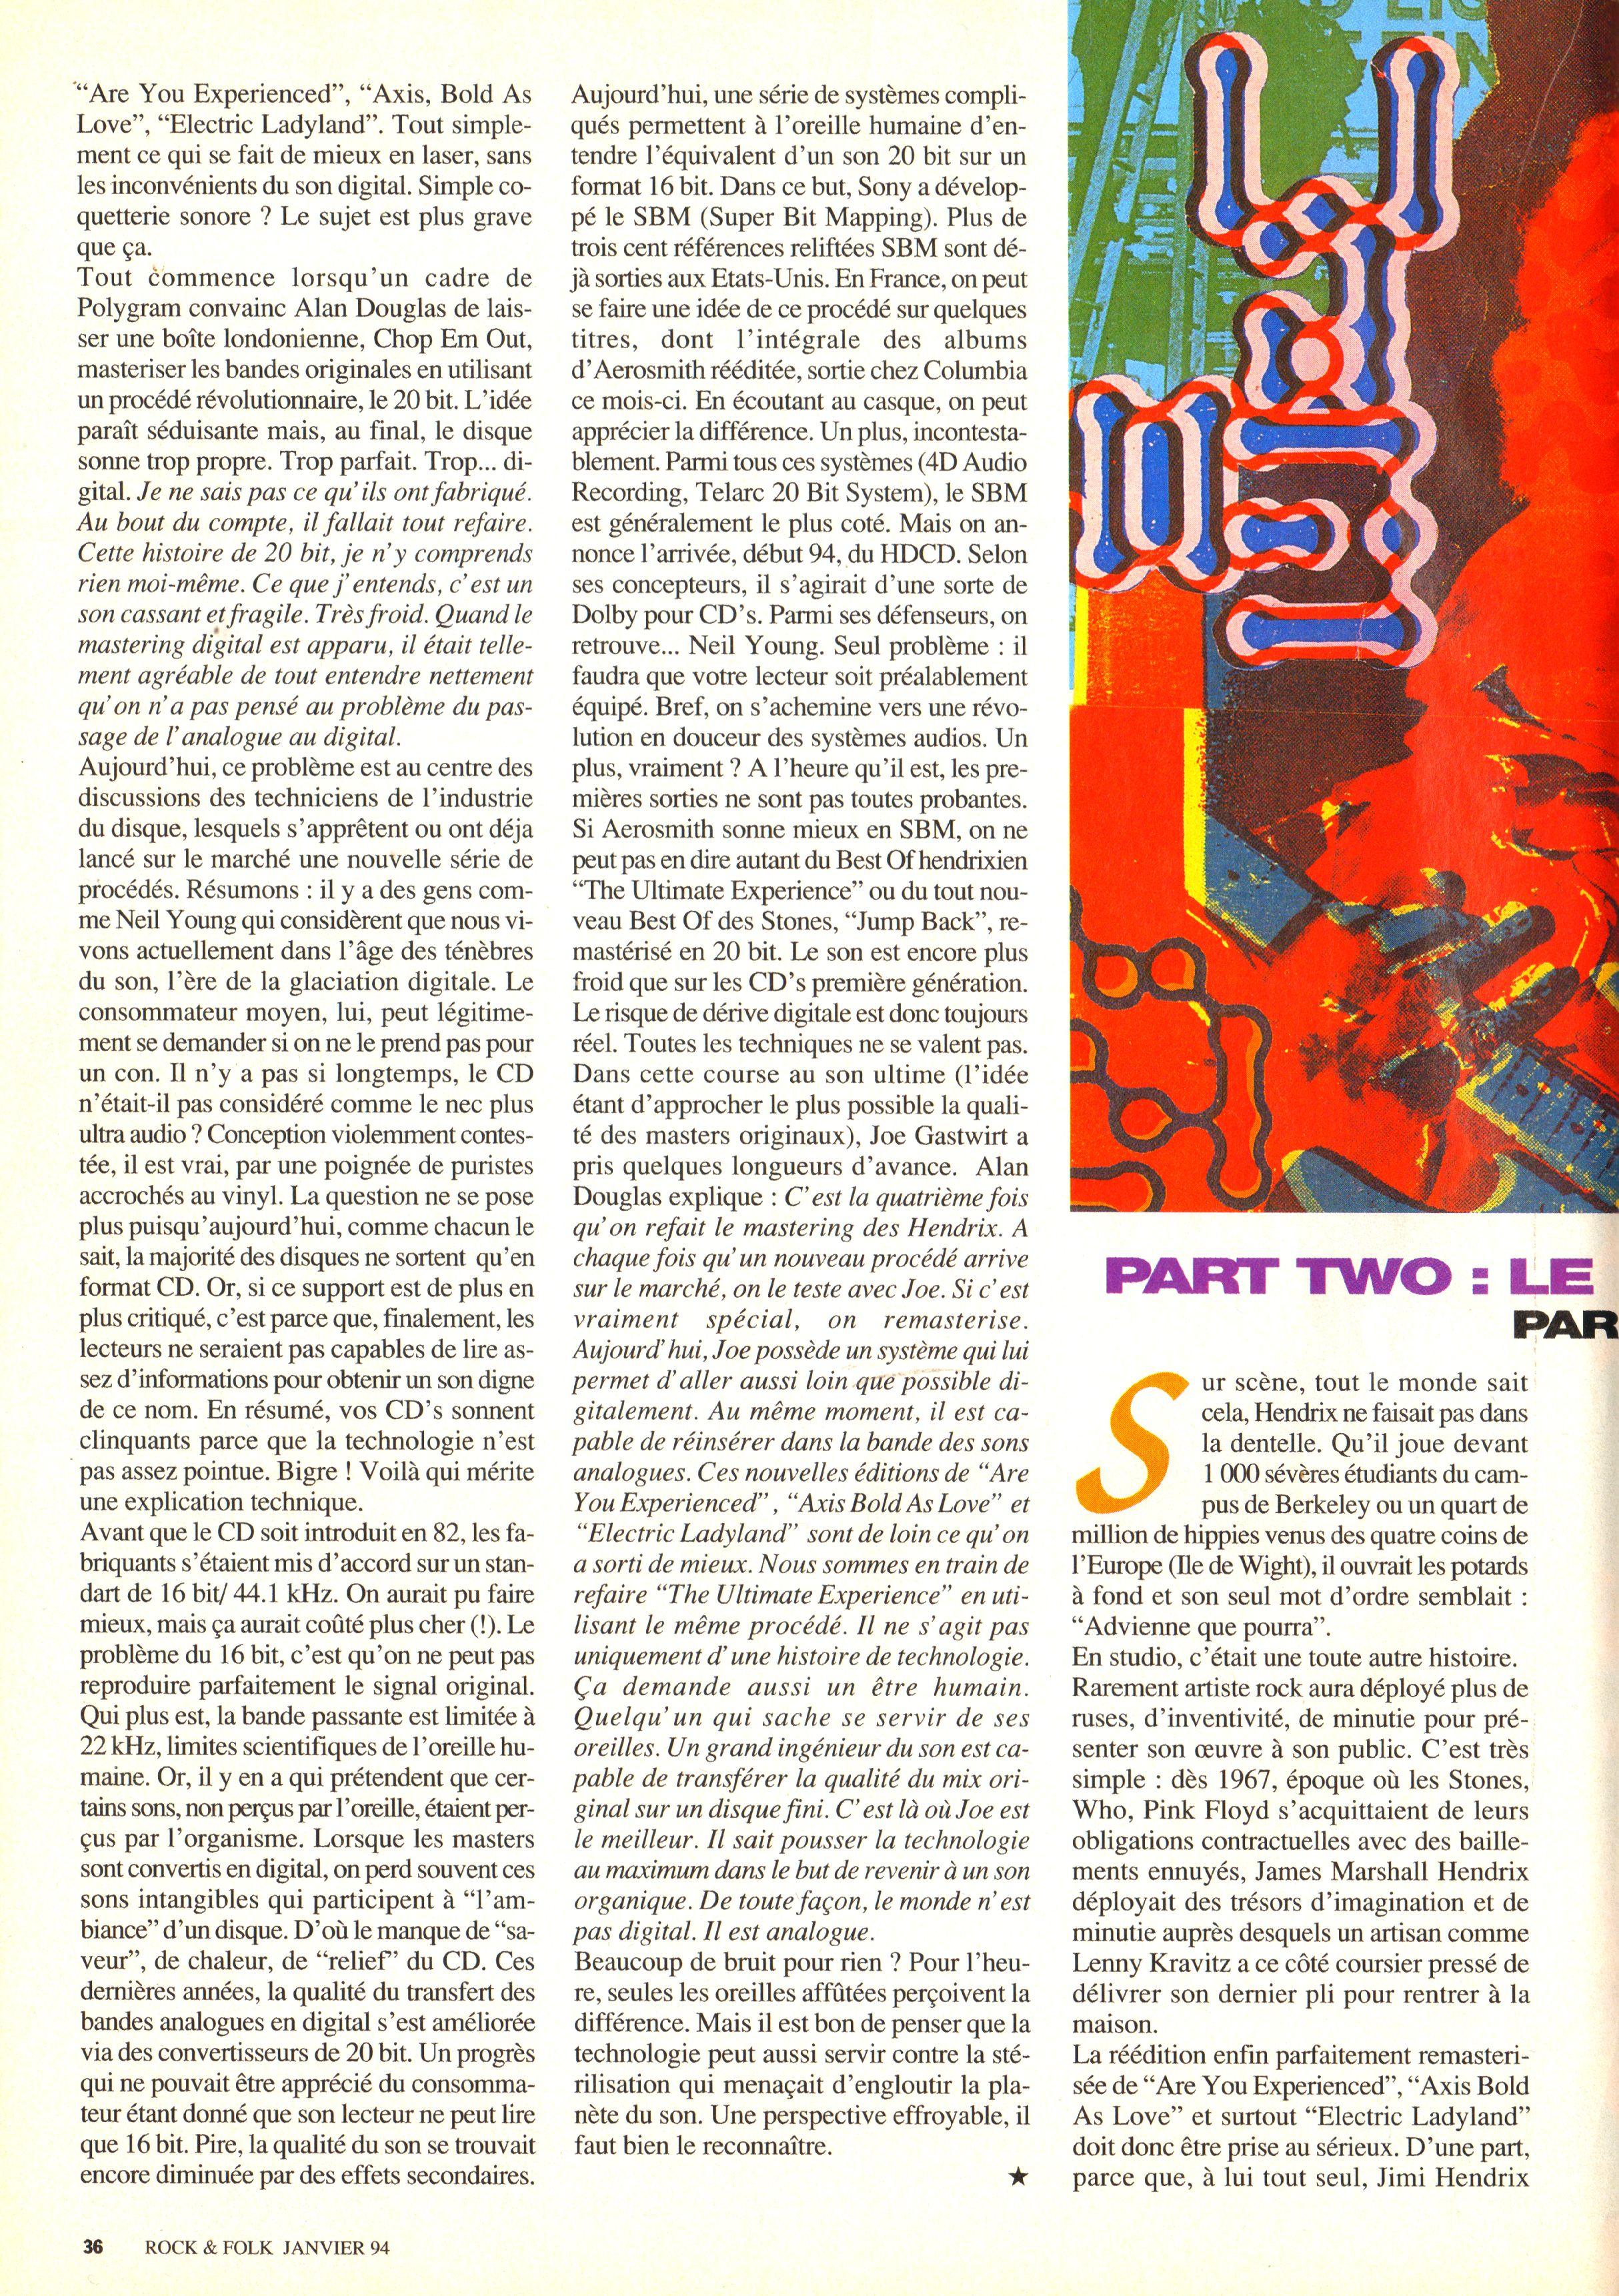 Magazines Français 1989 - 2014 RocketFolkJanvier1994Page36